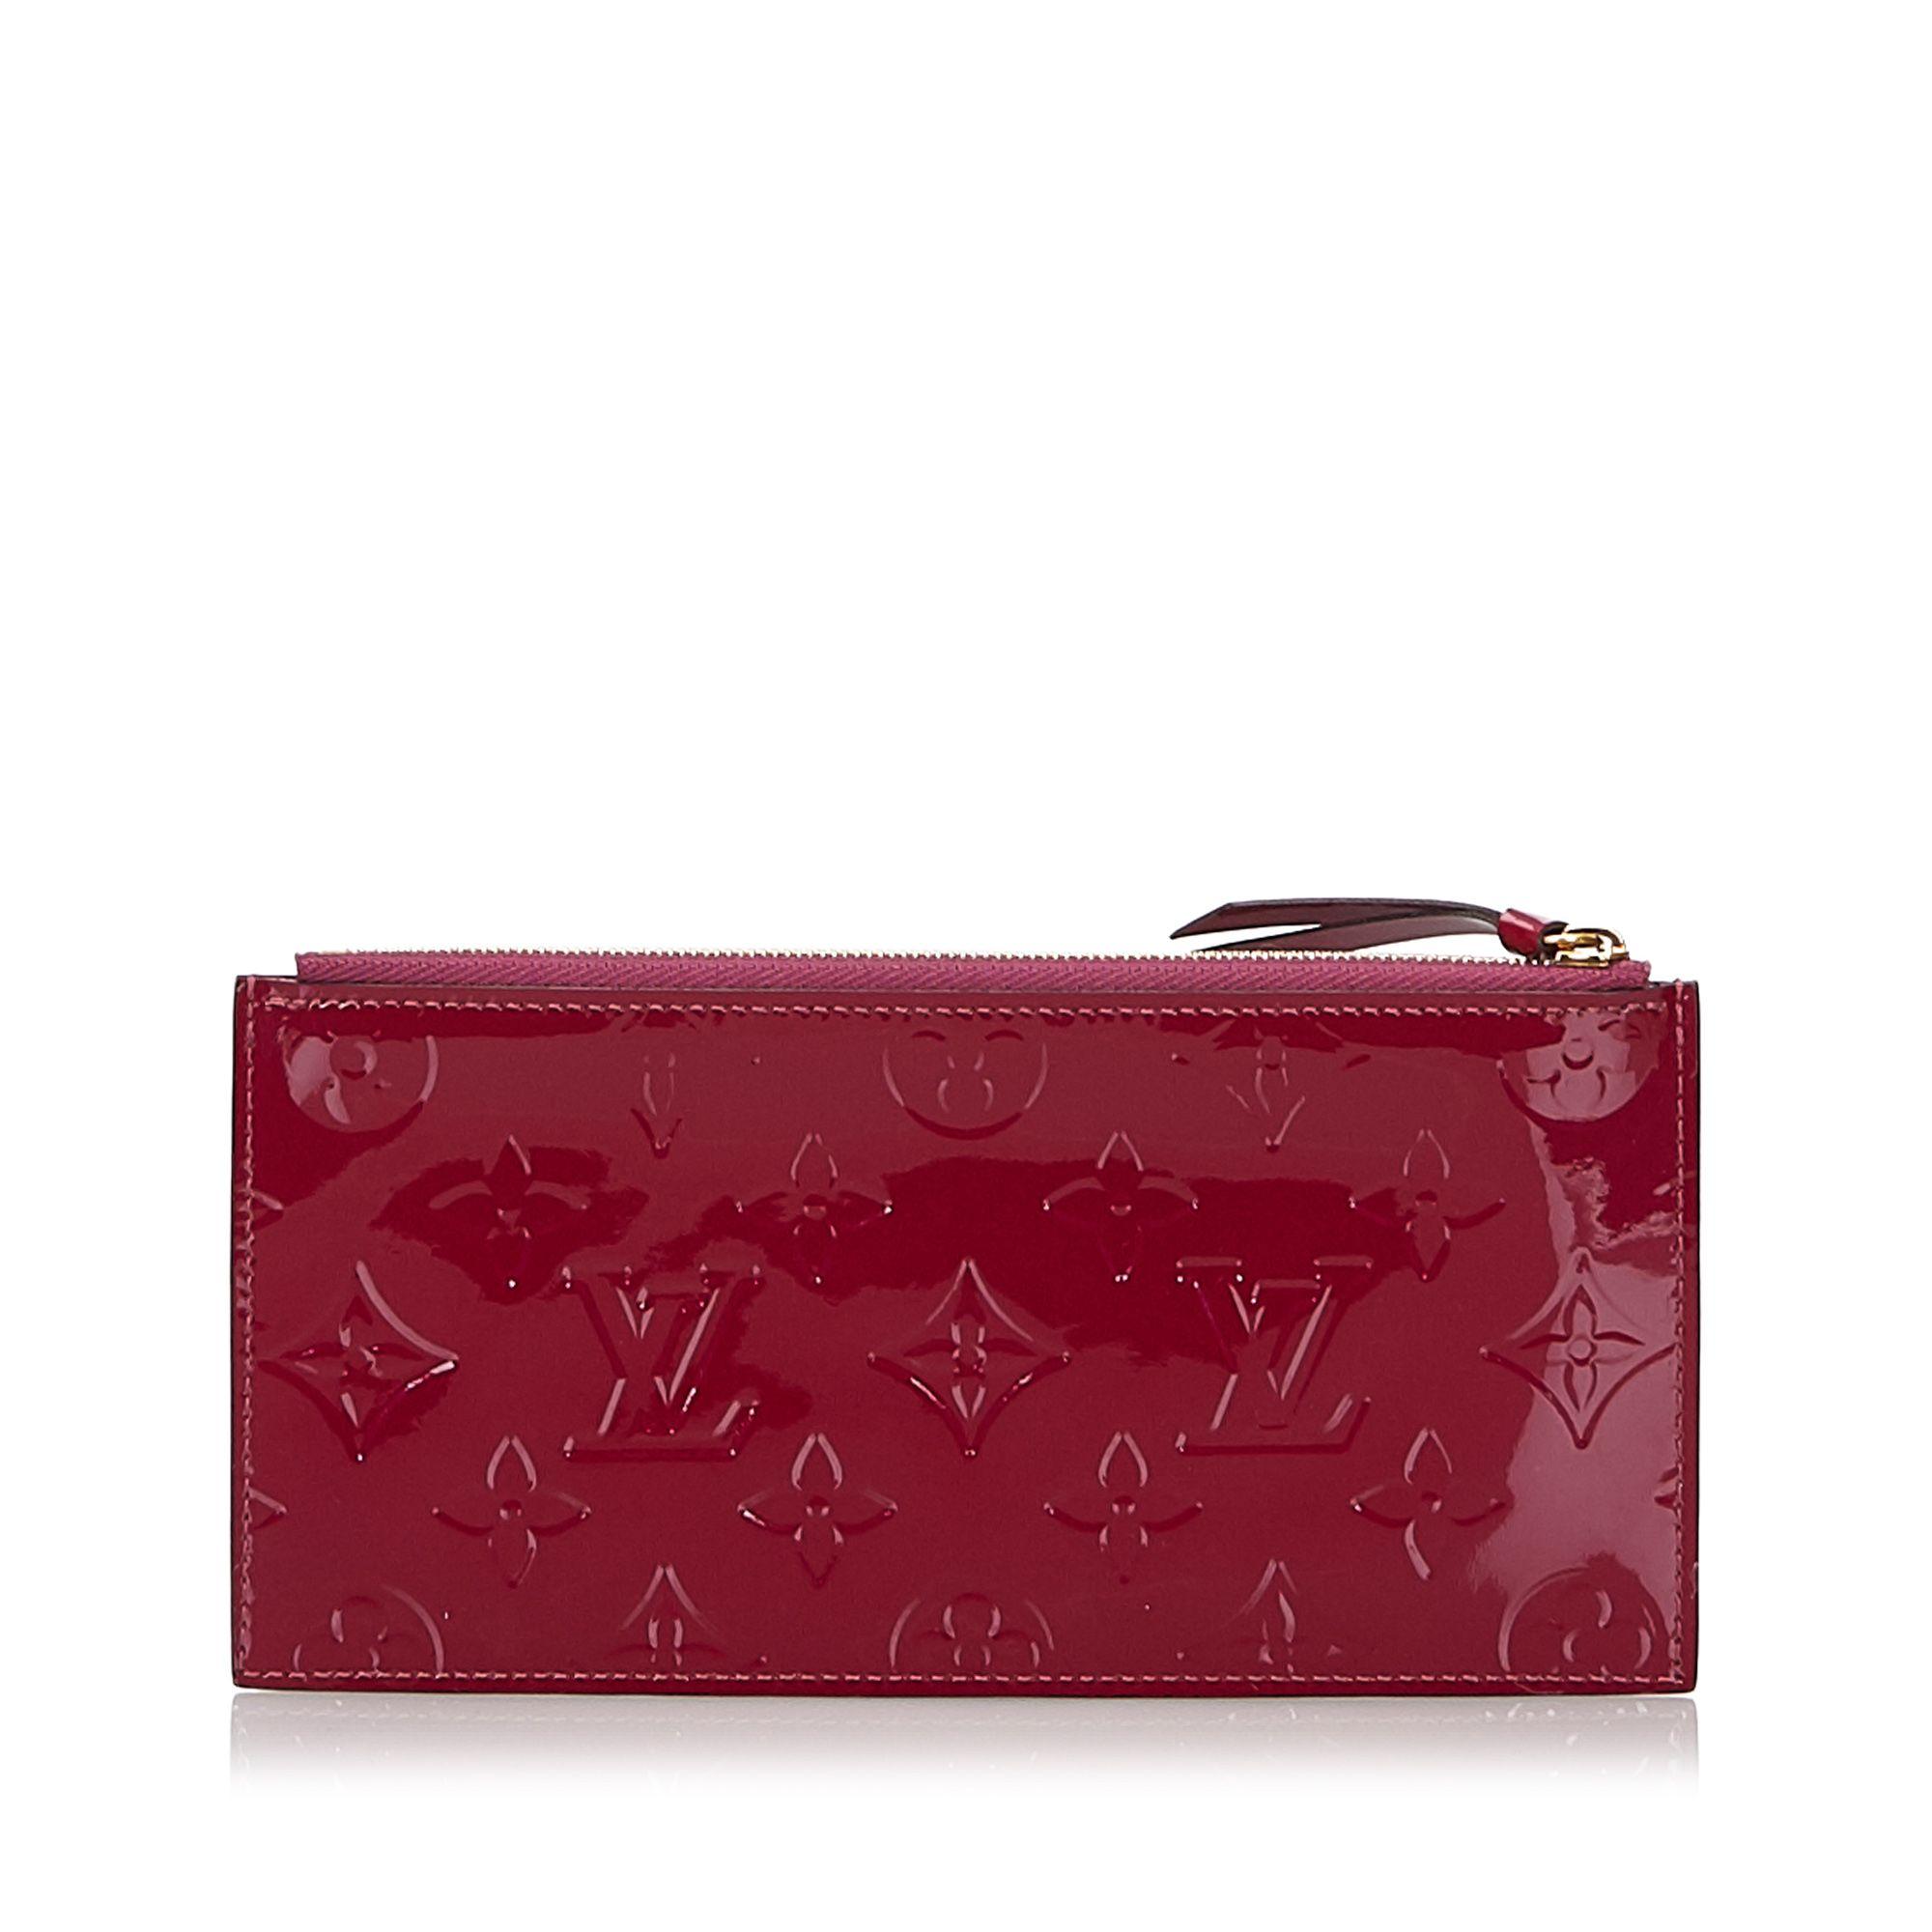 Vintage Louis Vuitton Vernis Josephine Wallet Zippered Insert Pink